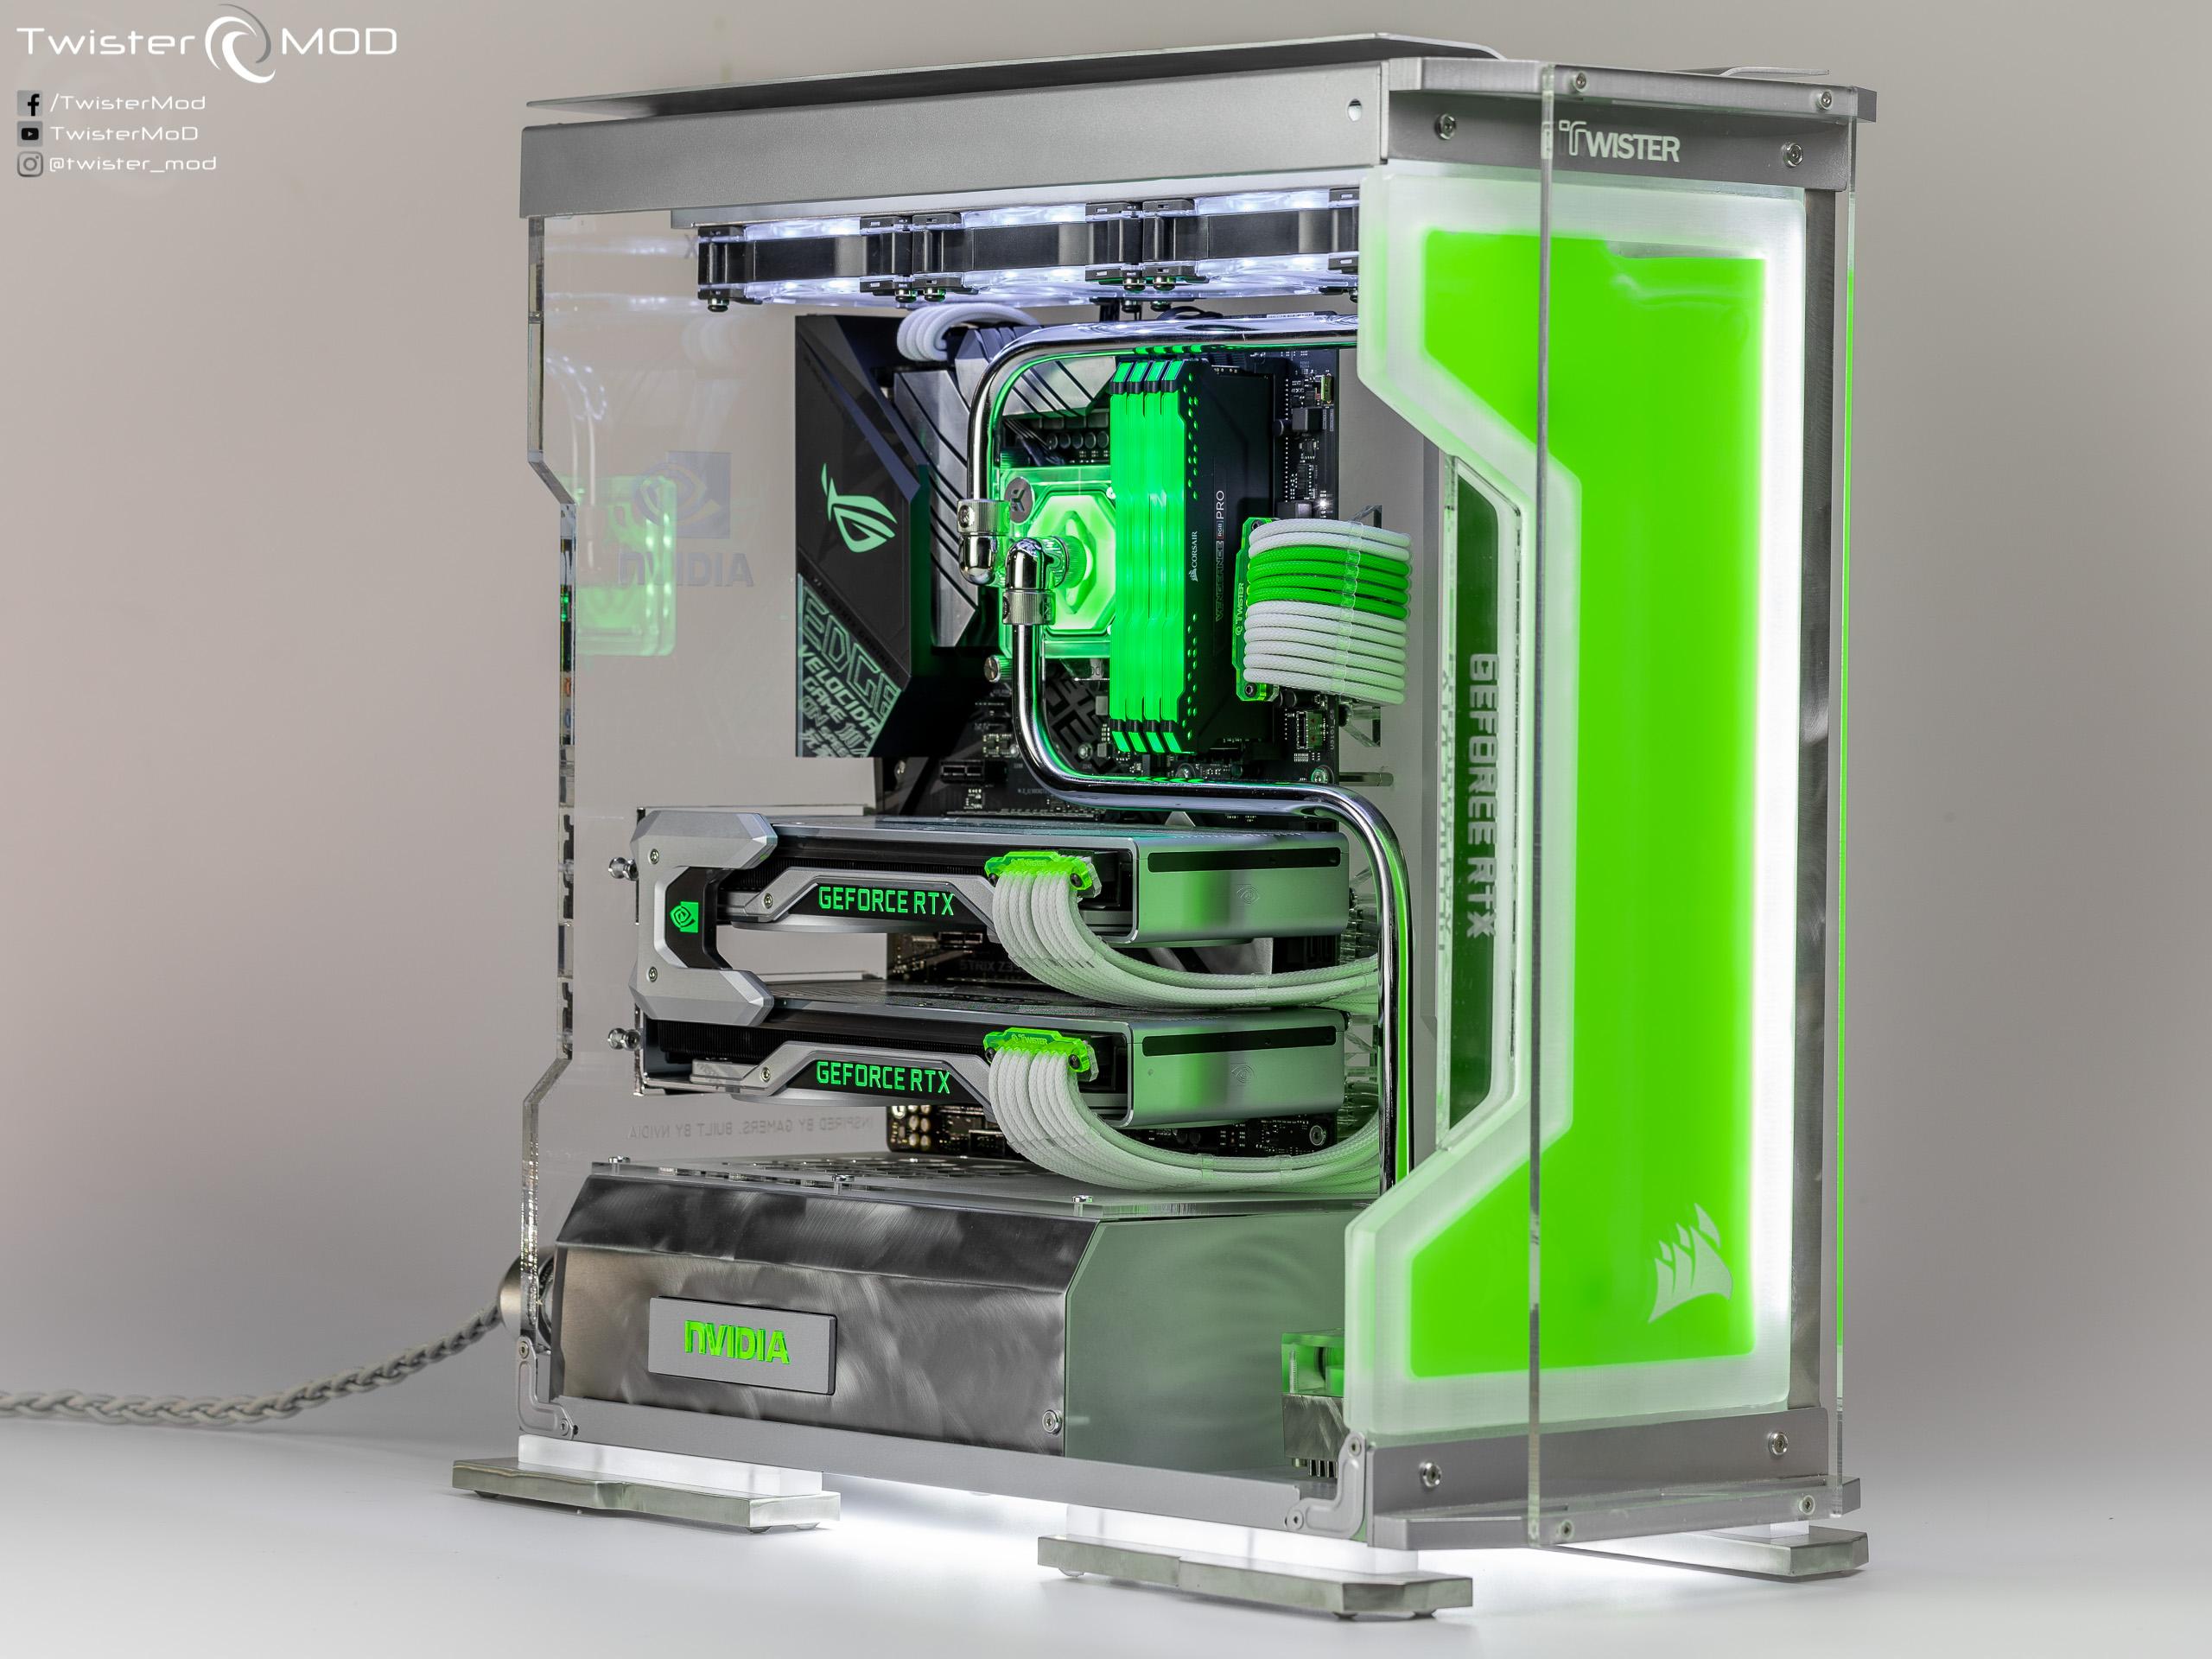 Twistermod_Corsair_Nvidia_500D_Radioactive_RTX_08